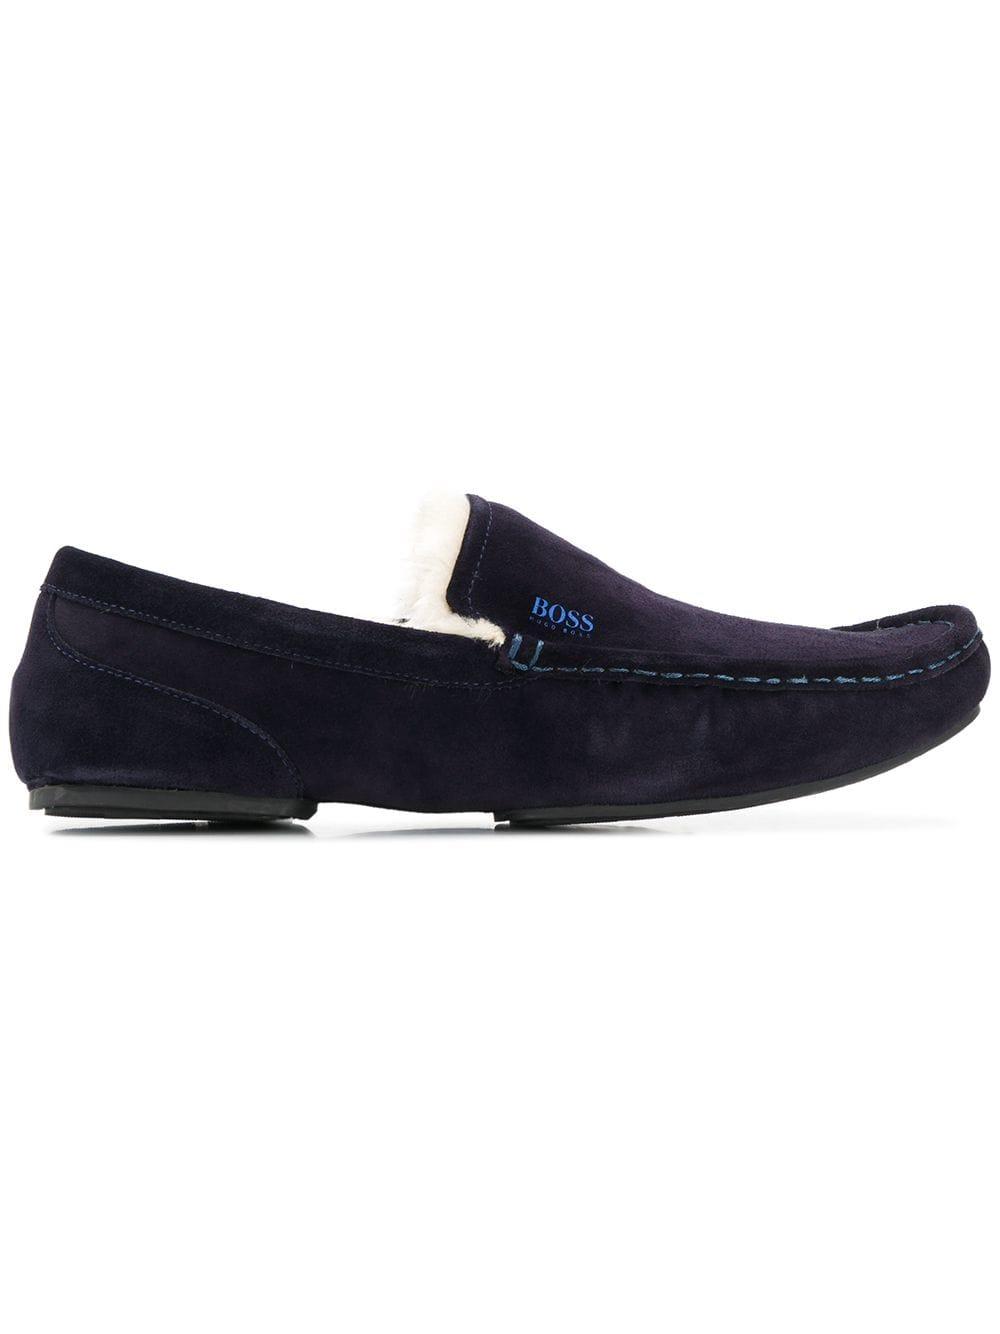 Hugo Boss Suede Loafers In Blue